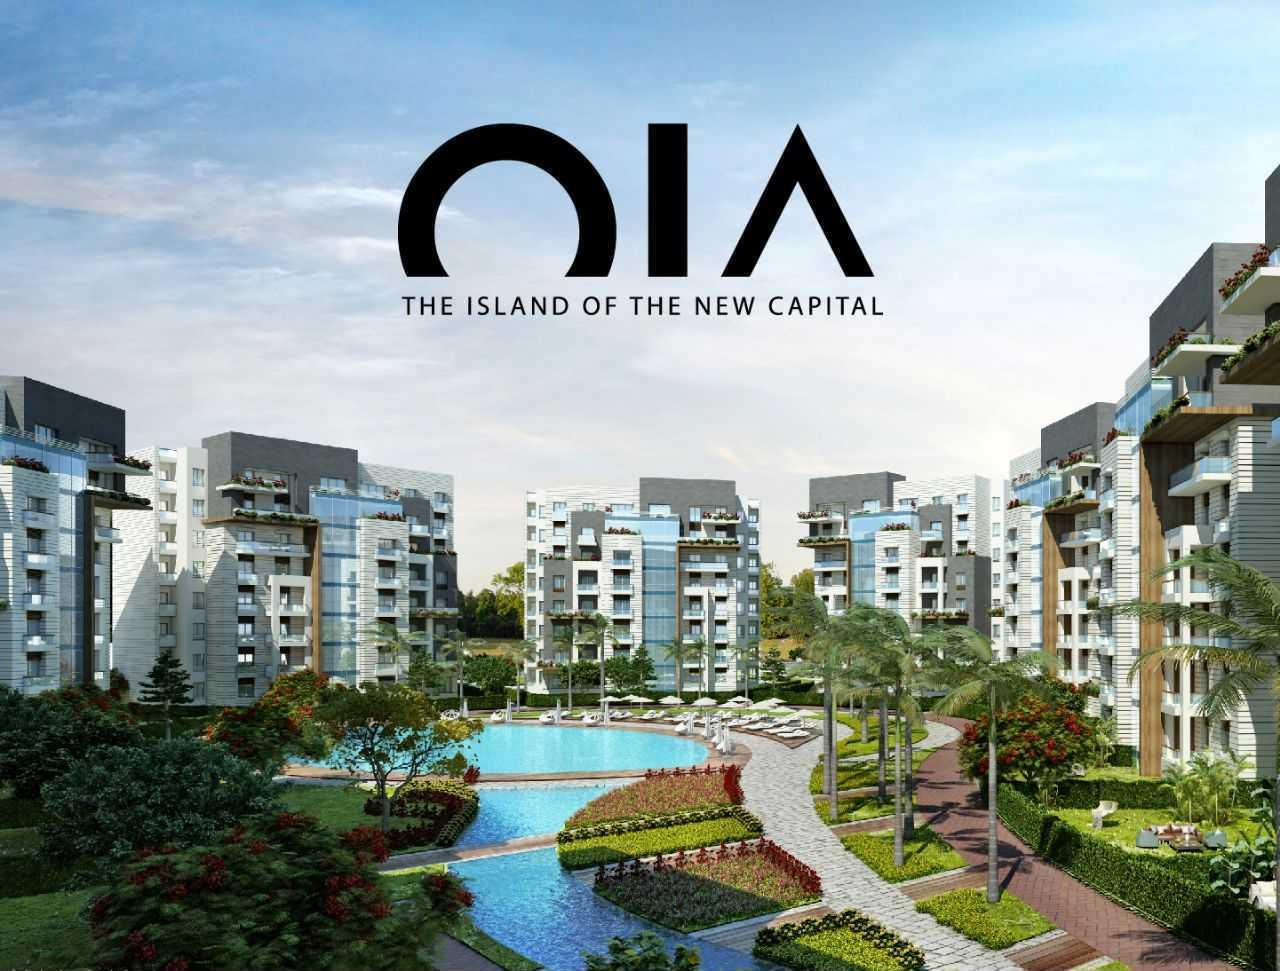 Oia New Capital Residences By Edge Holding-كمبوند-أويا-ايدج-العاصمة-الإدارية-الجديدة-شركة-إيدج-هولدينج (8)